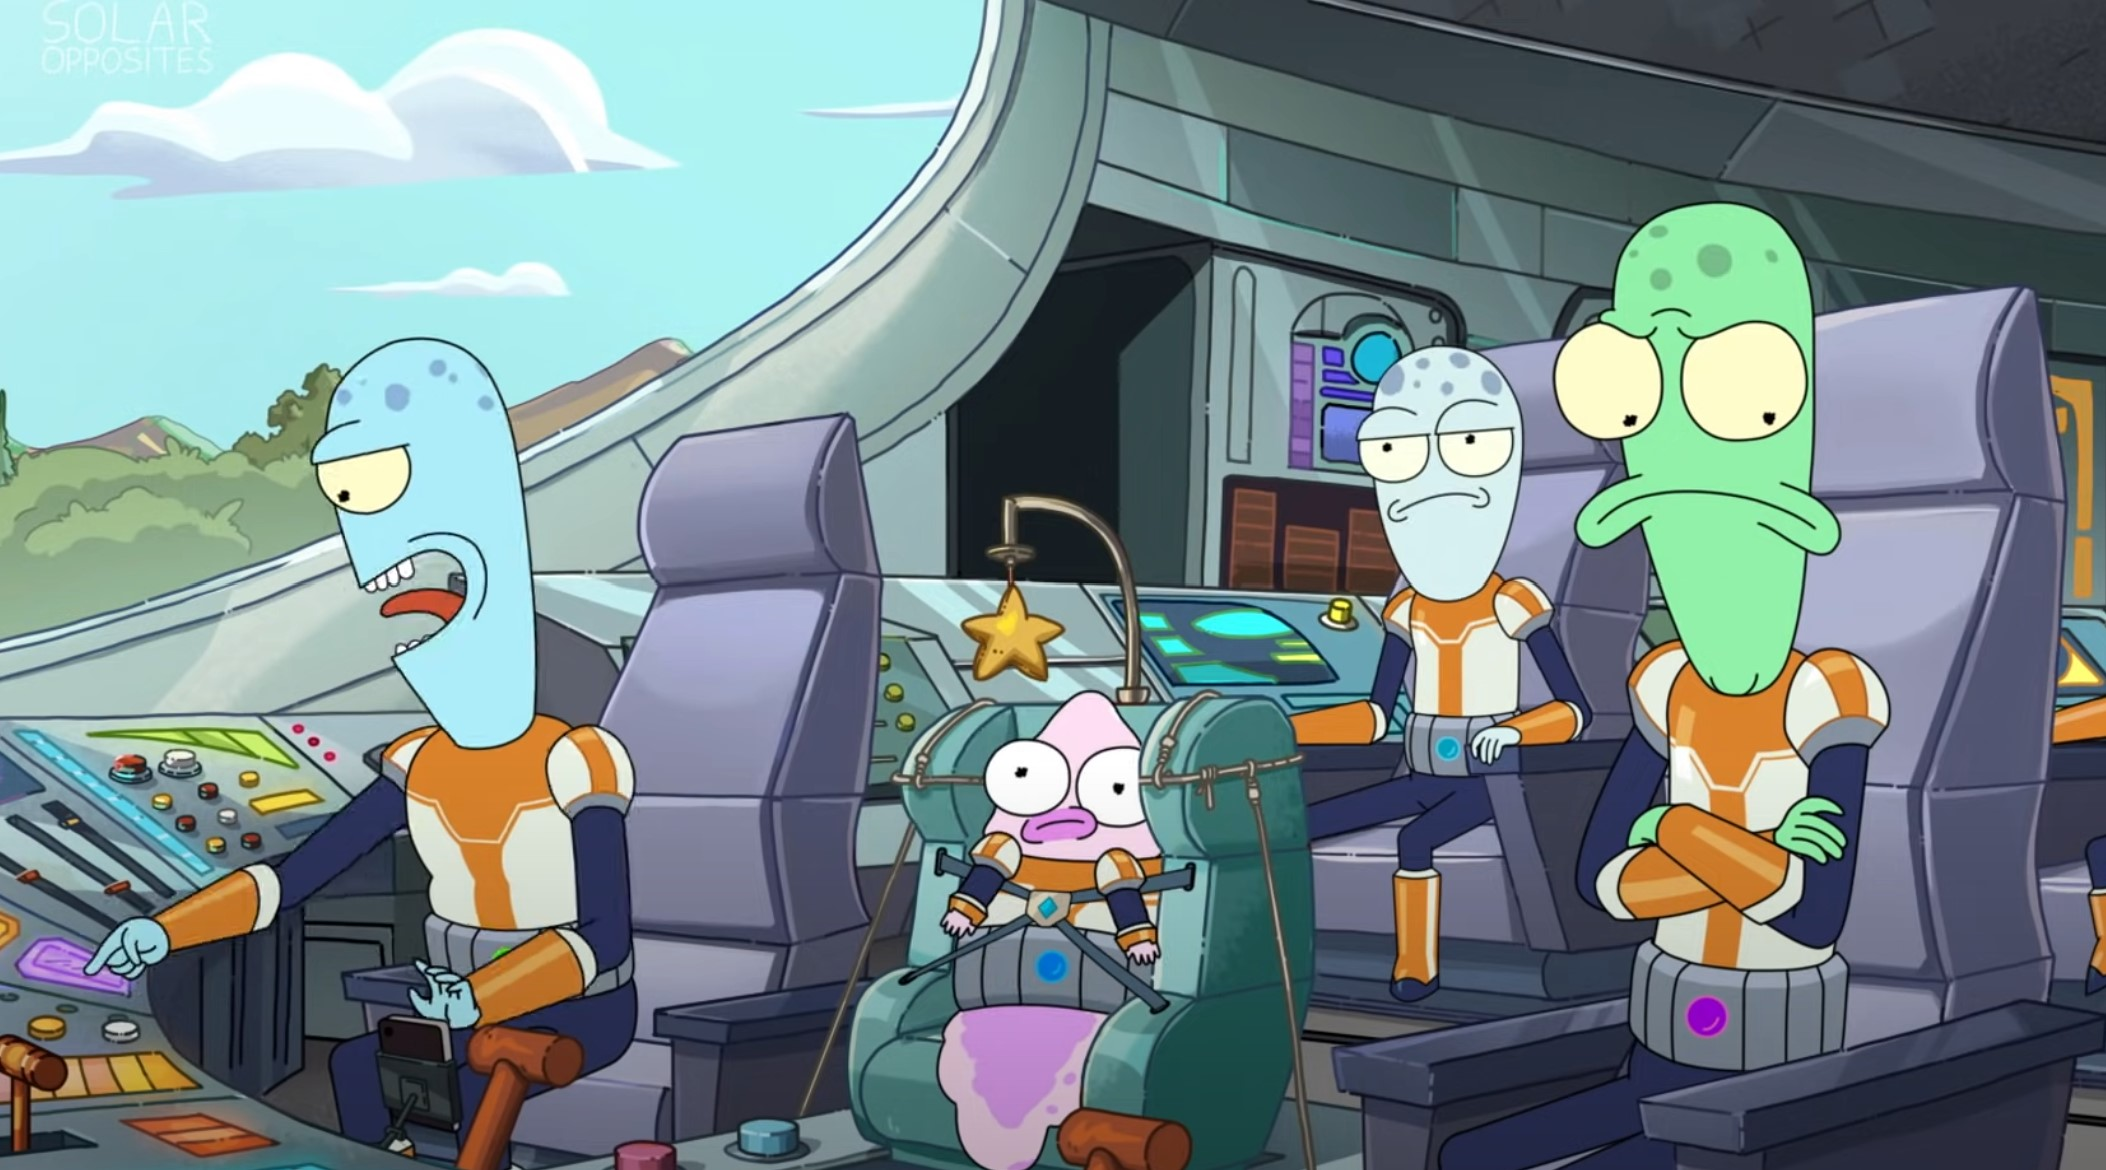 Solar Opposites Renewed For Season 4, Release Date!!